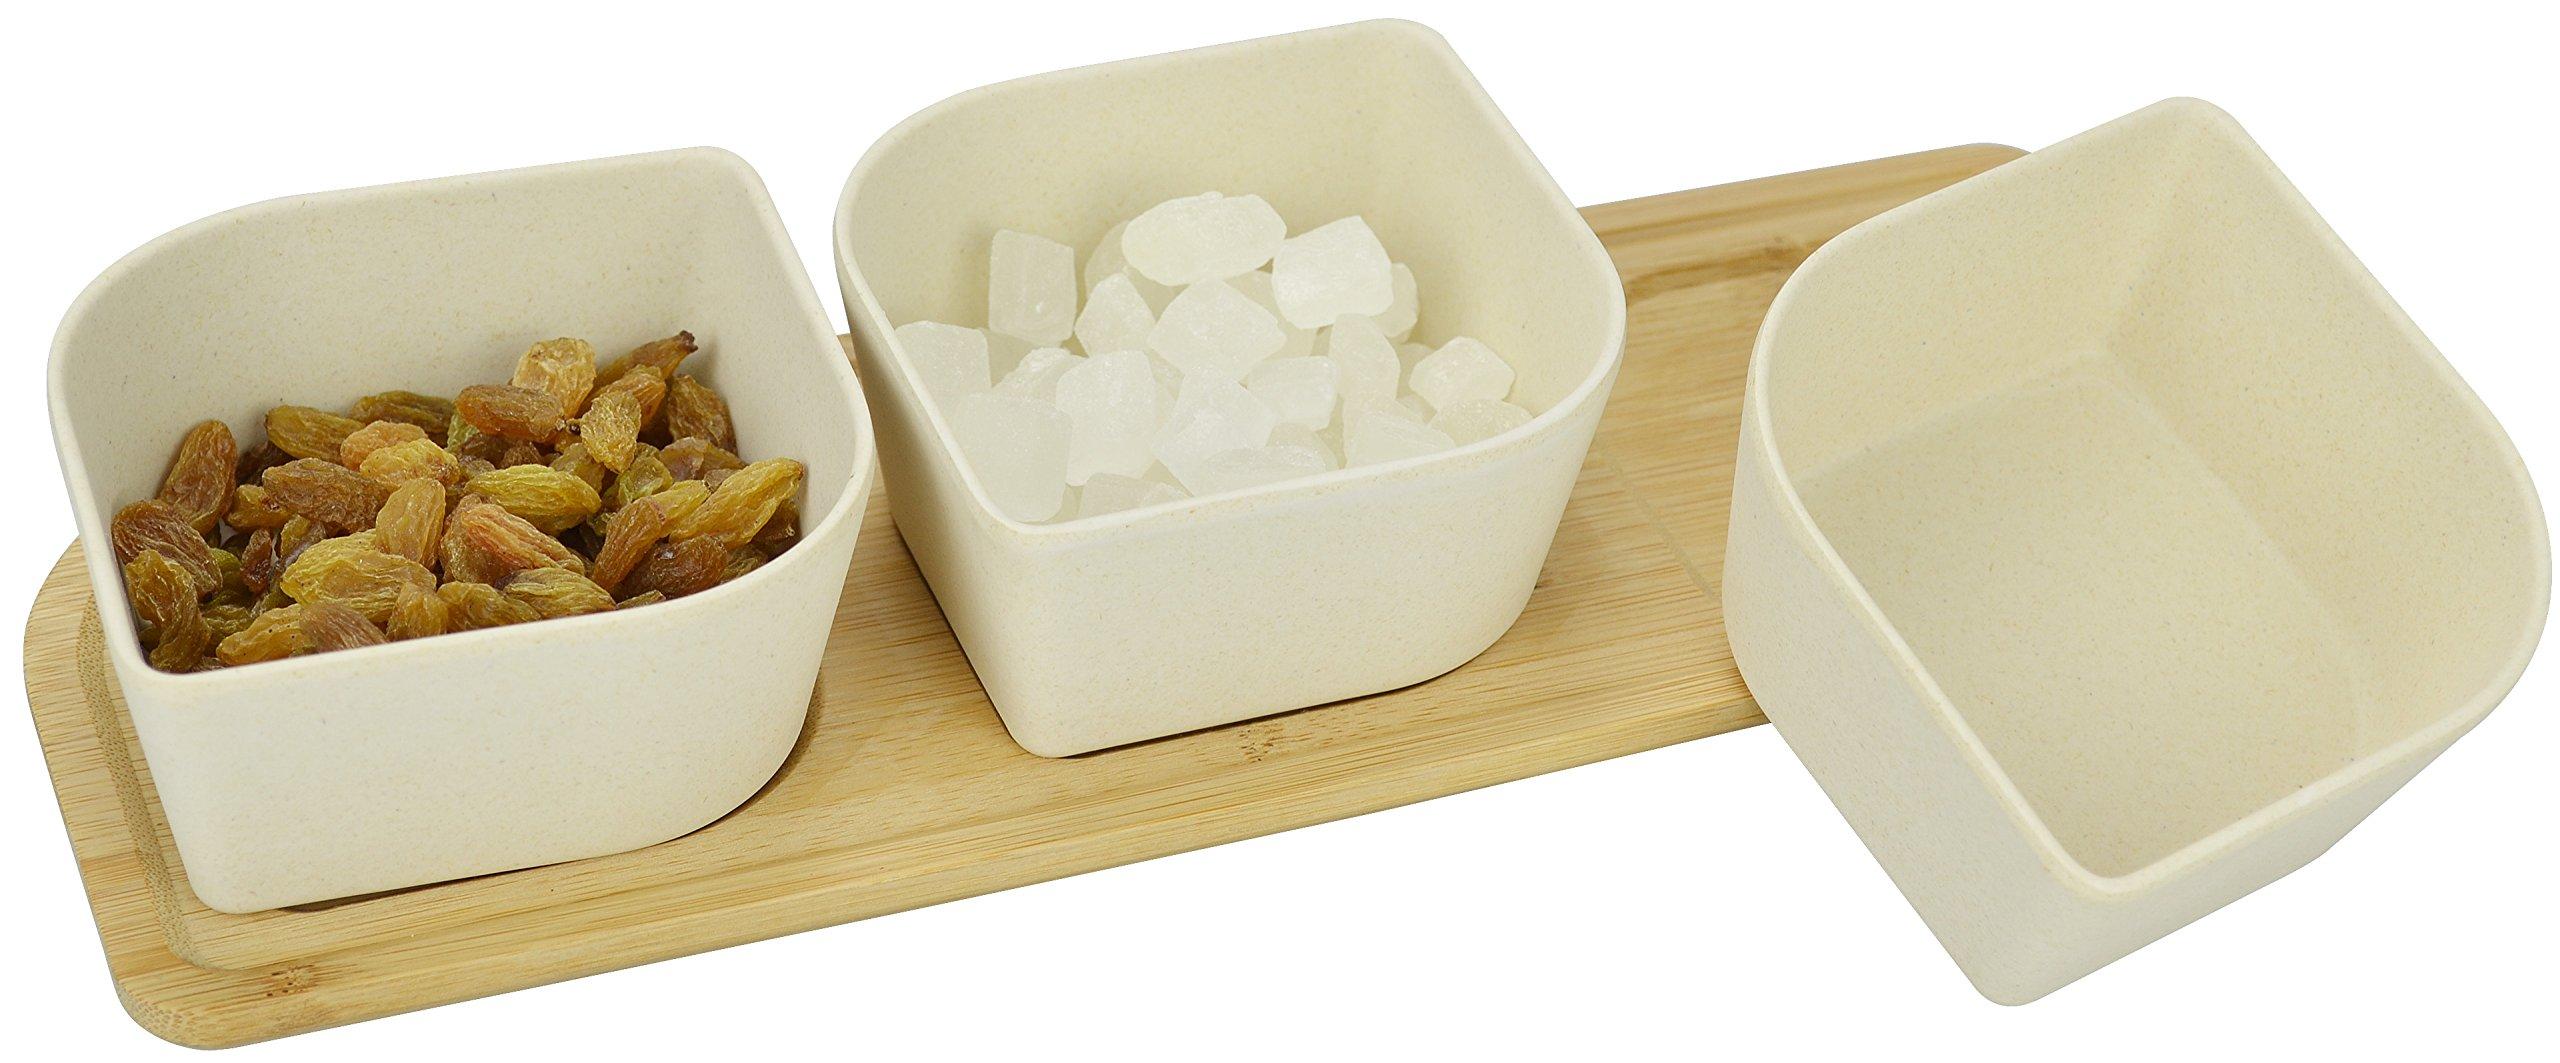 Surpahs Bamboo Fiber Snacks Serving Bowl Set w/ Bamboo Tray